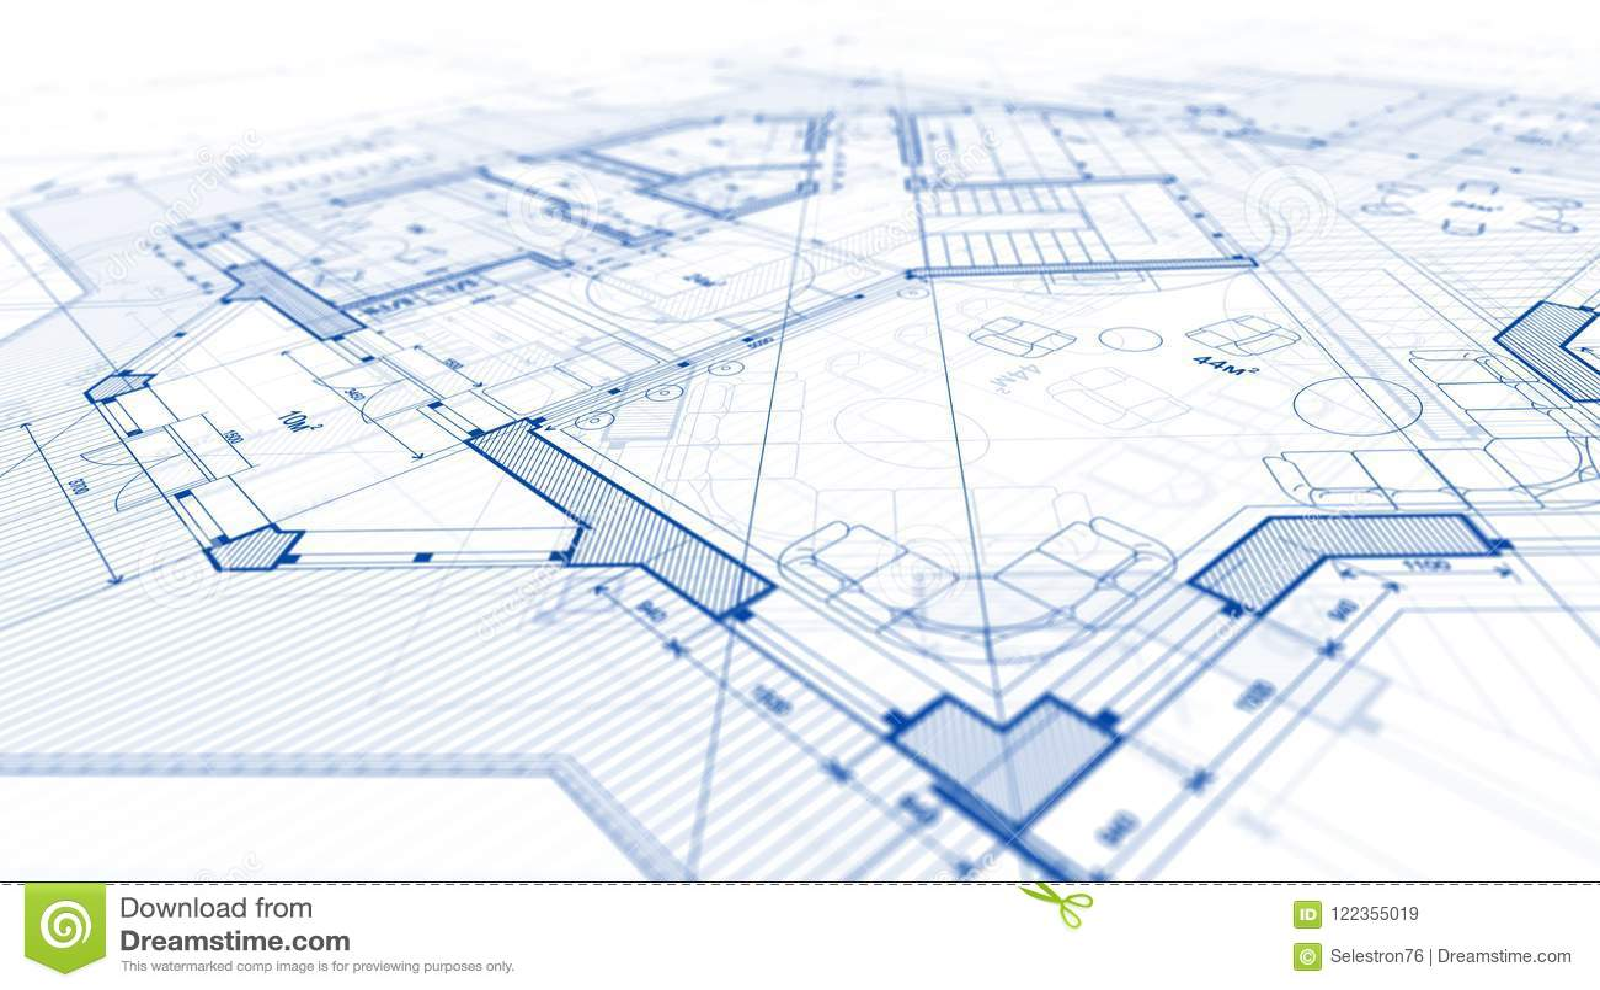 Architekturdesign: Planplan - Illustration eines Planumb.